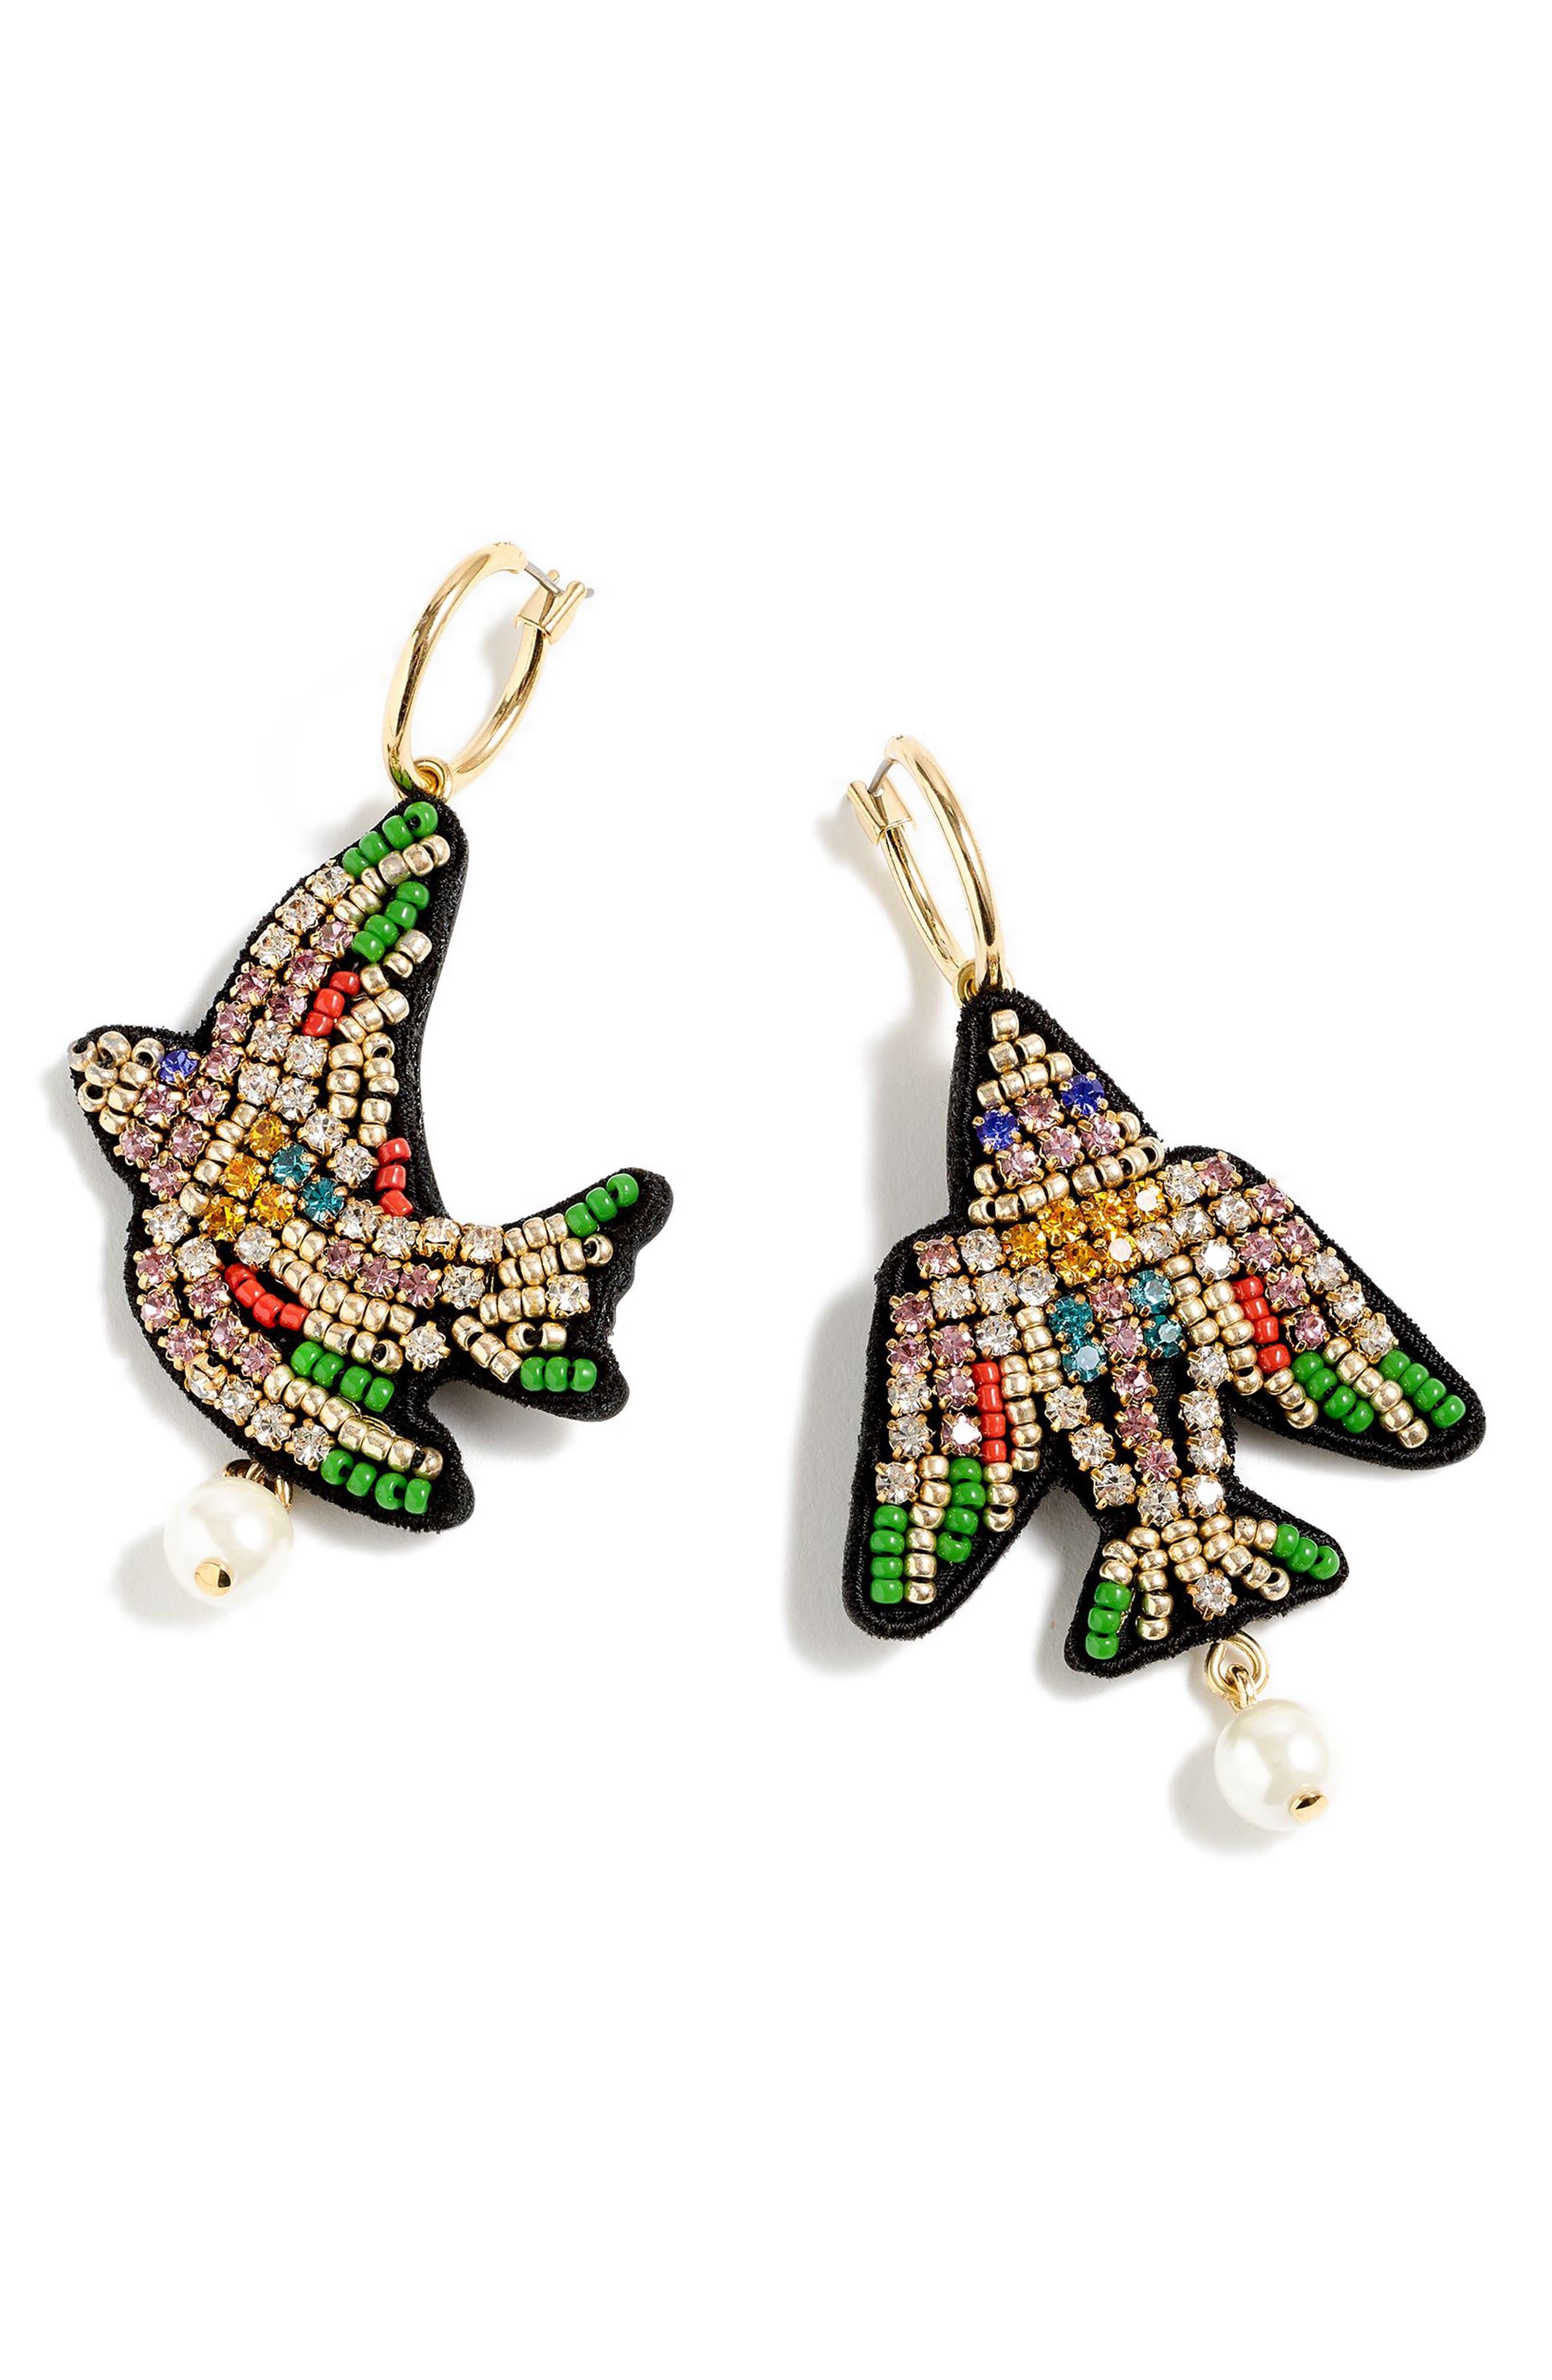 Leather-Backed Beaded Bird Earrings,                         Main,                         color, GREEN MULTI